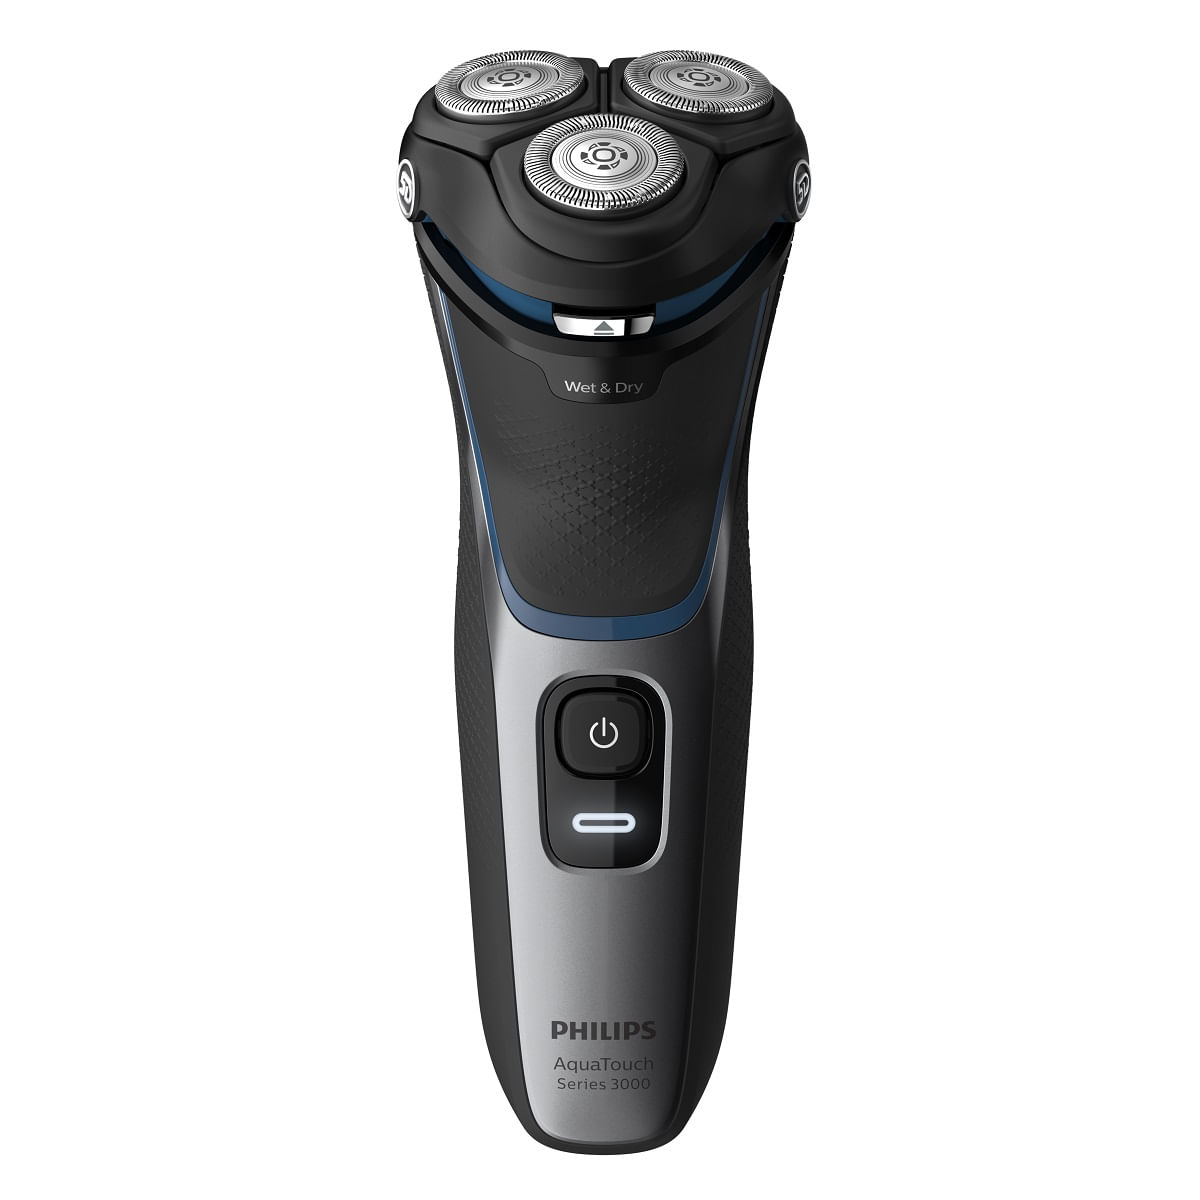 Barbeador 3100 Philips - S3122/51 - Preto Brilhante